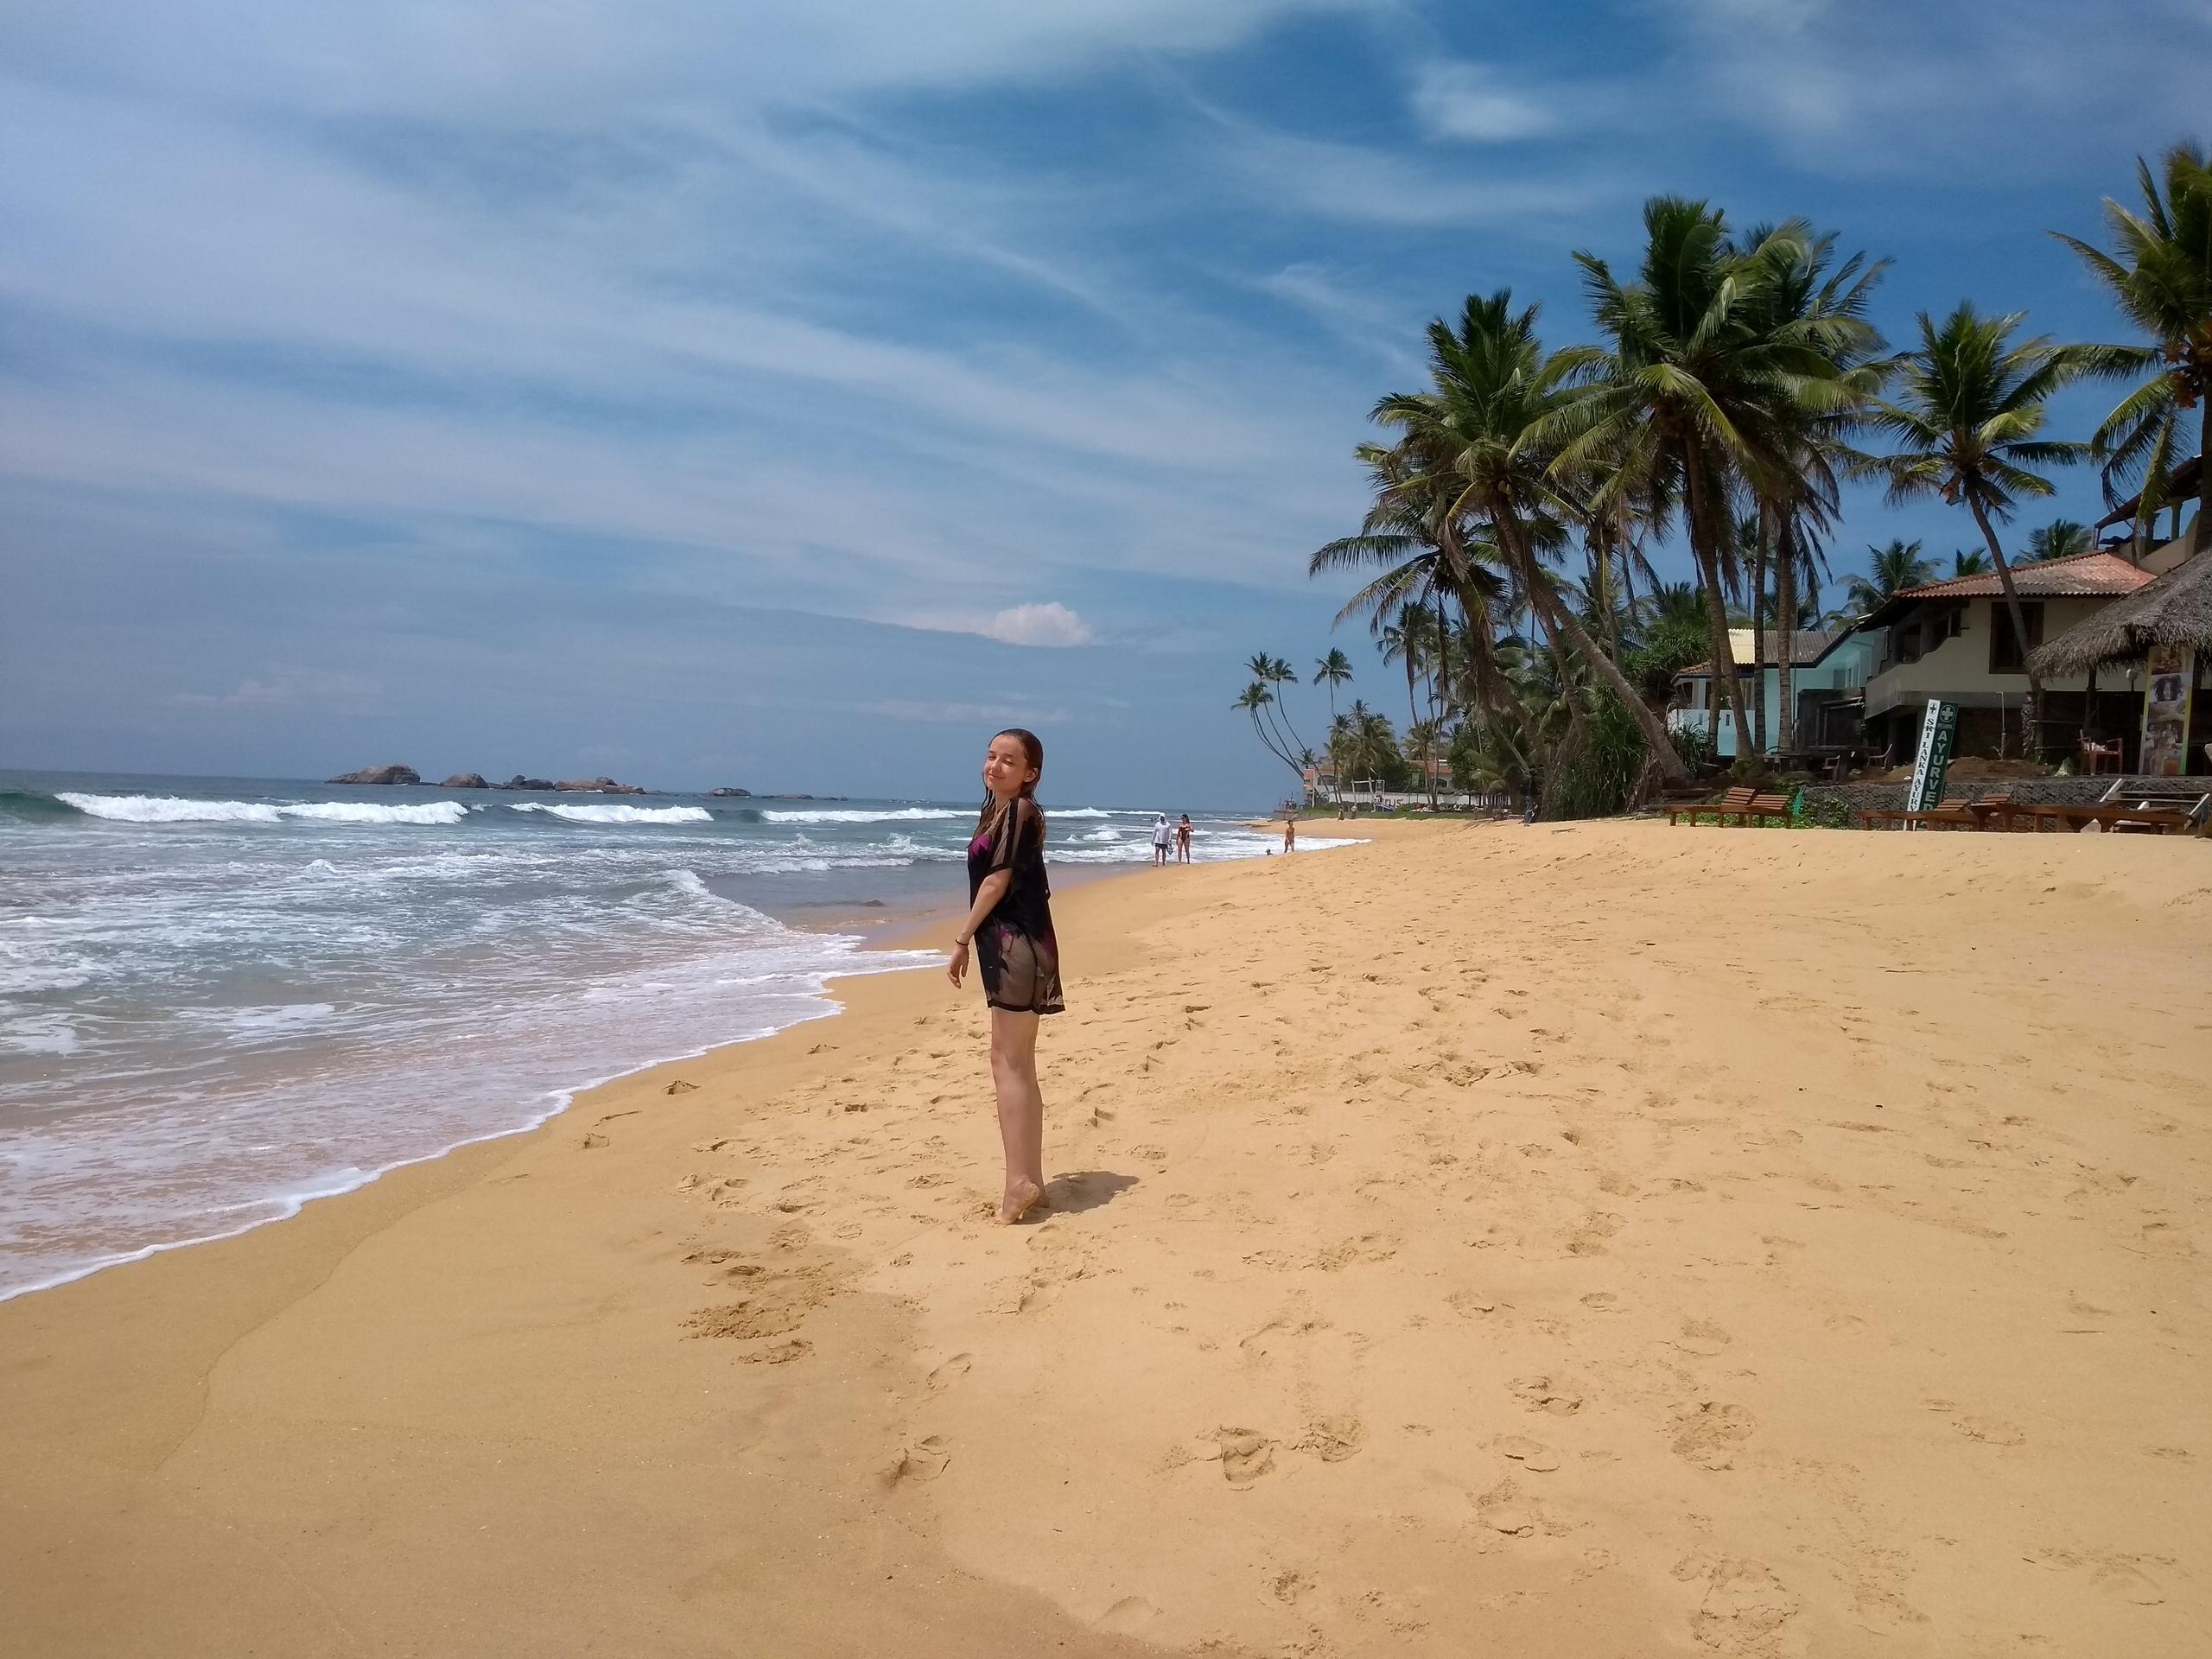 Шри Ланка (фото) - Страница 11 JOLNC2VlQ1Y